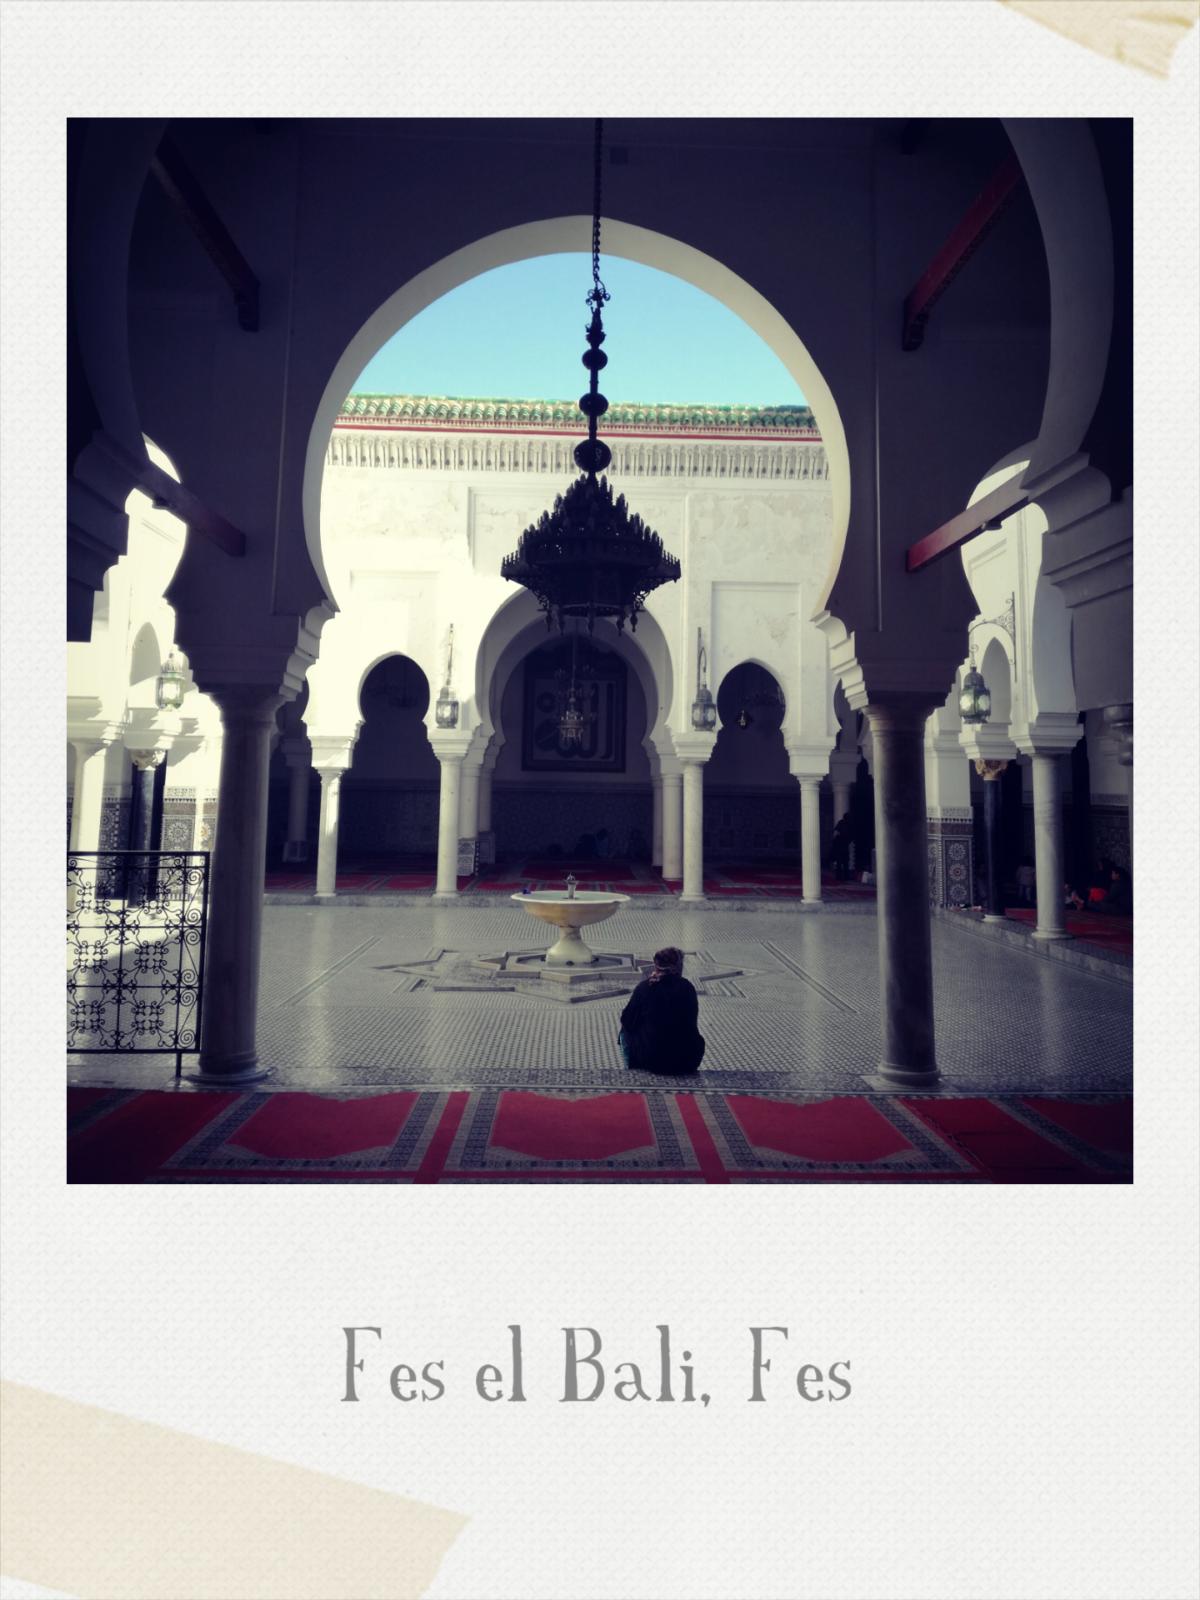 Fes el Bali _ Fes, 21 febbraio